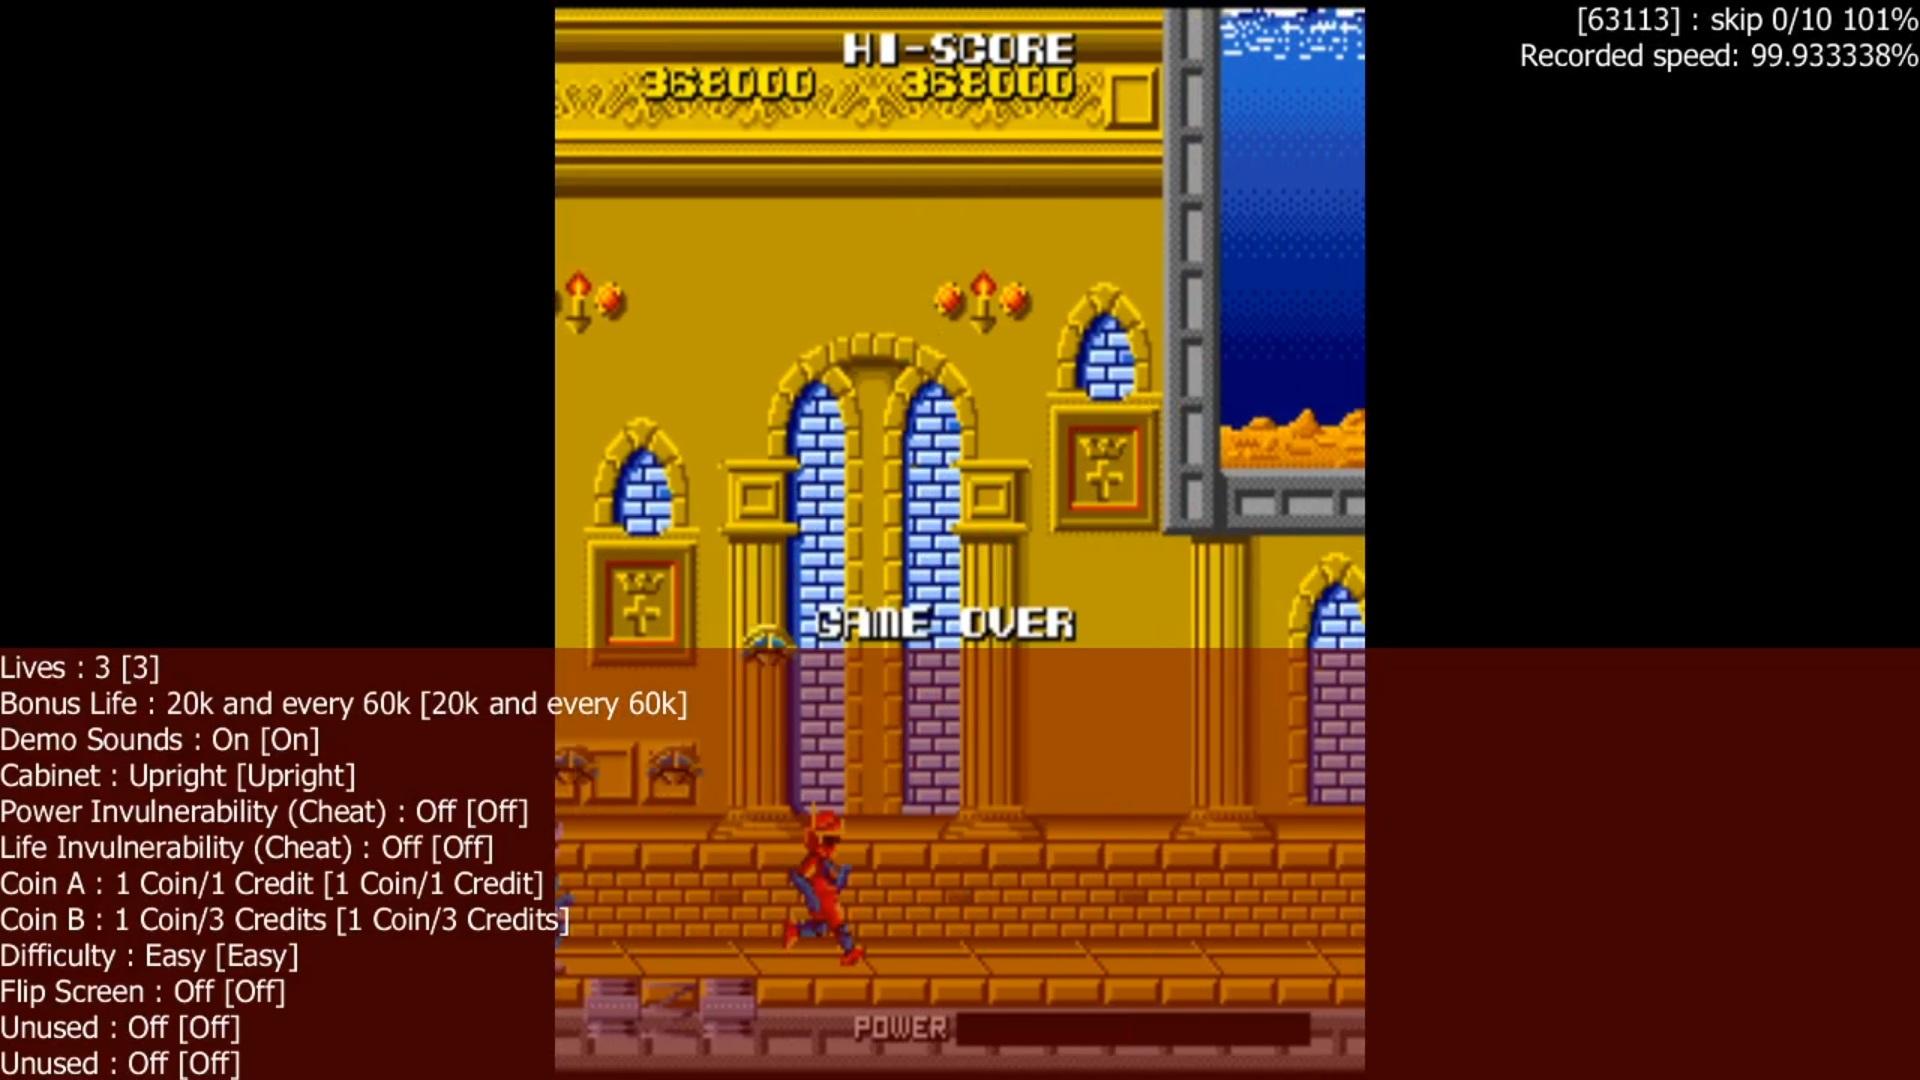 LuigiRuffolo: Cosmo Police Galivan [galivan] (Arcade Emulated / M.A.M.E.) 368,000 points on 2020-05-22 09:06:41